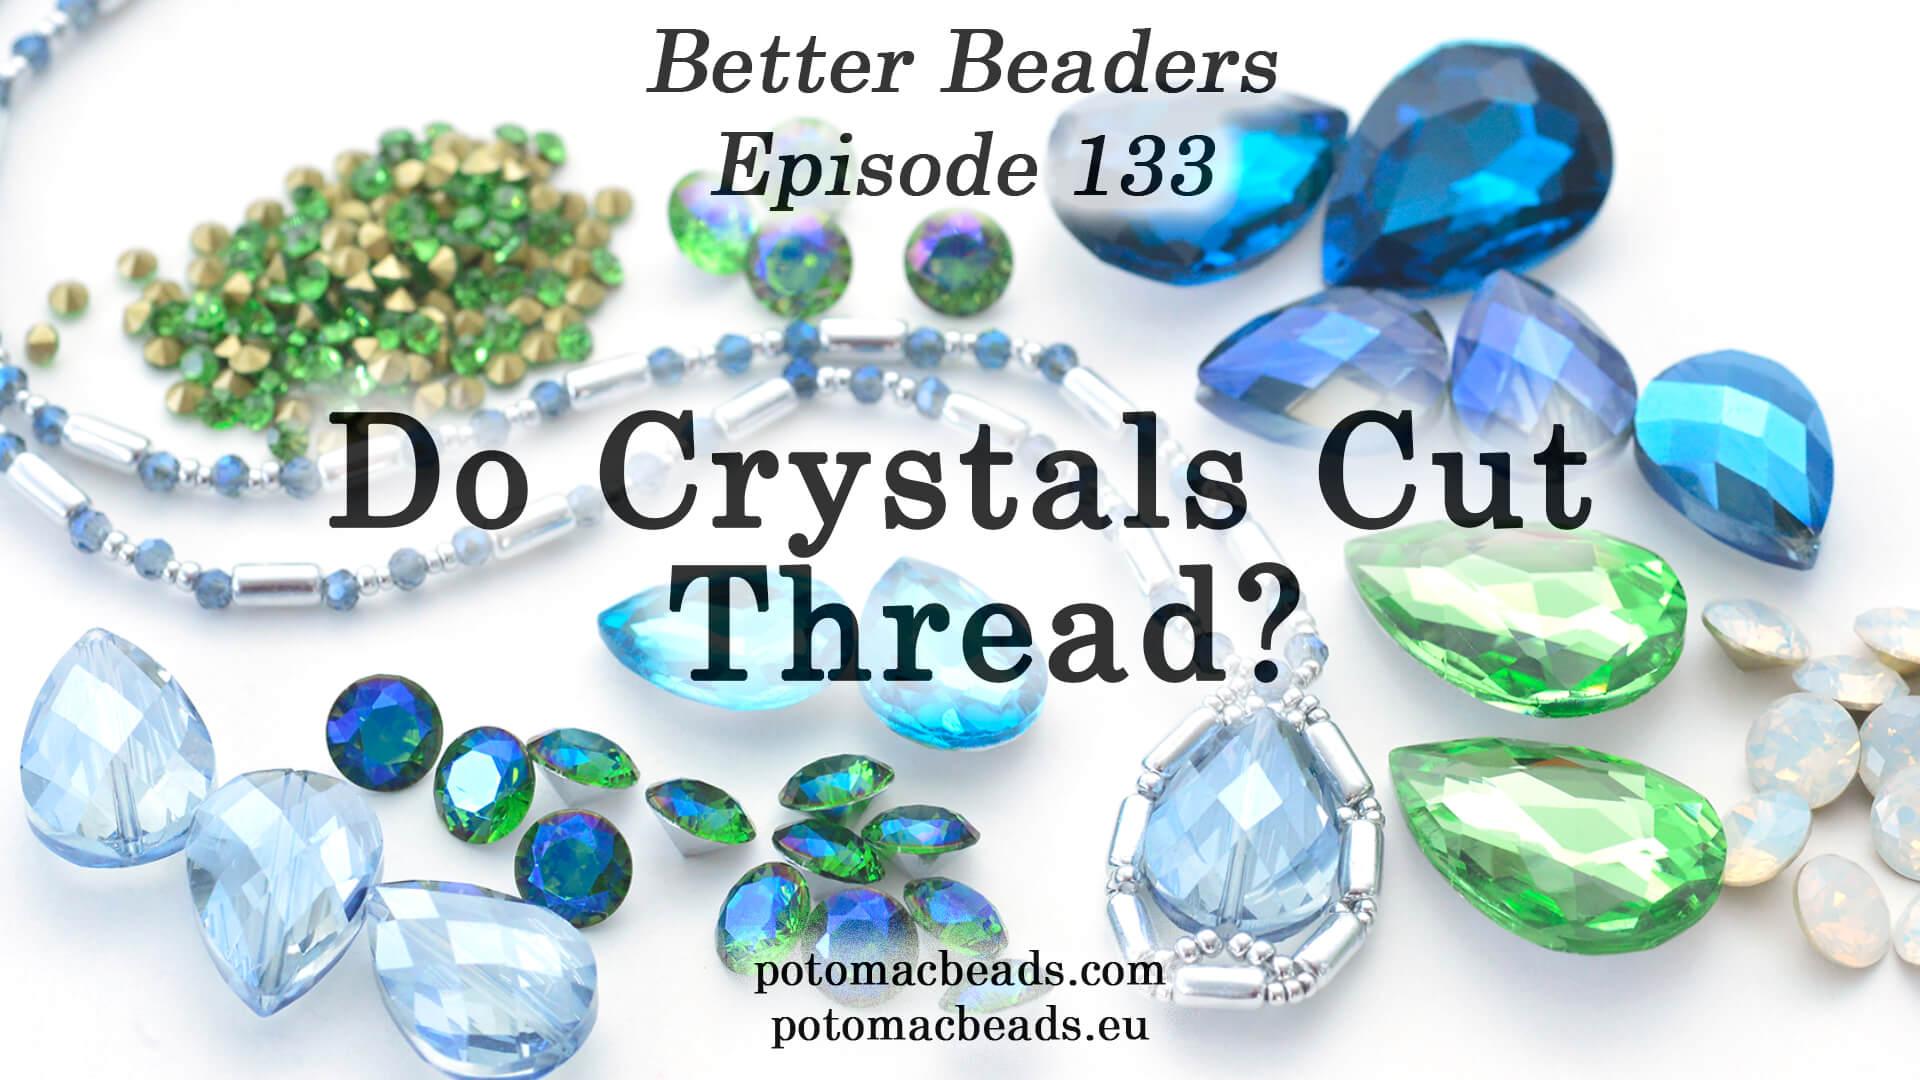 How to Bead / Better Beader Episodes / Better Beader Episode 133 - Do Crystal Beads Cut Thread?